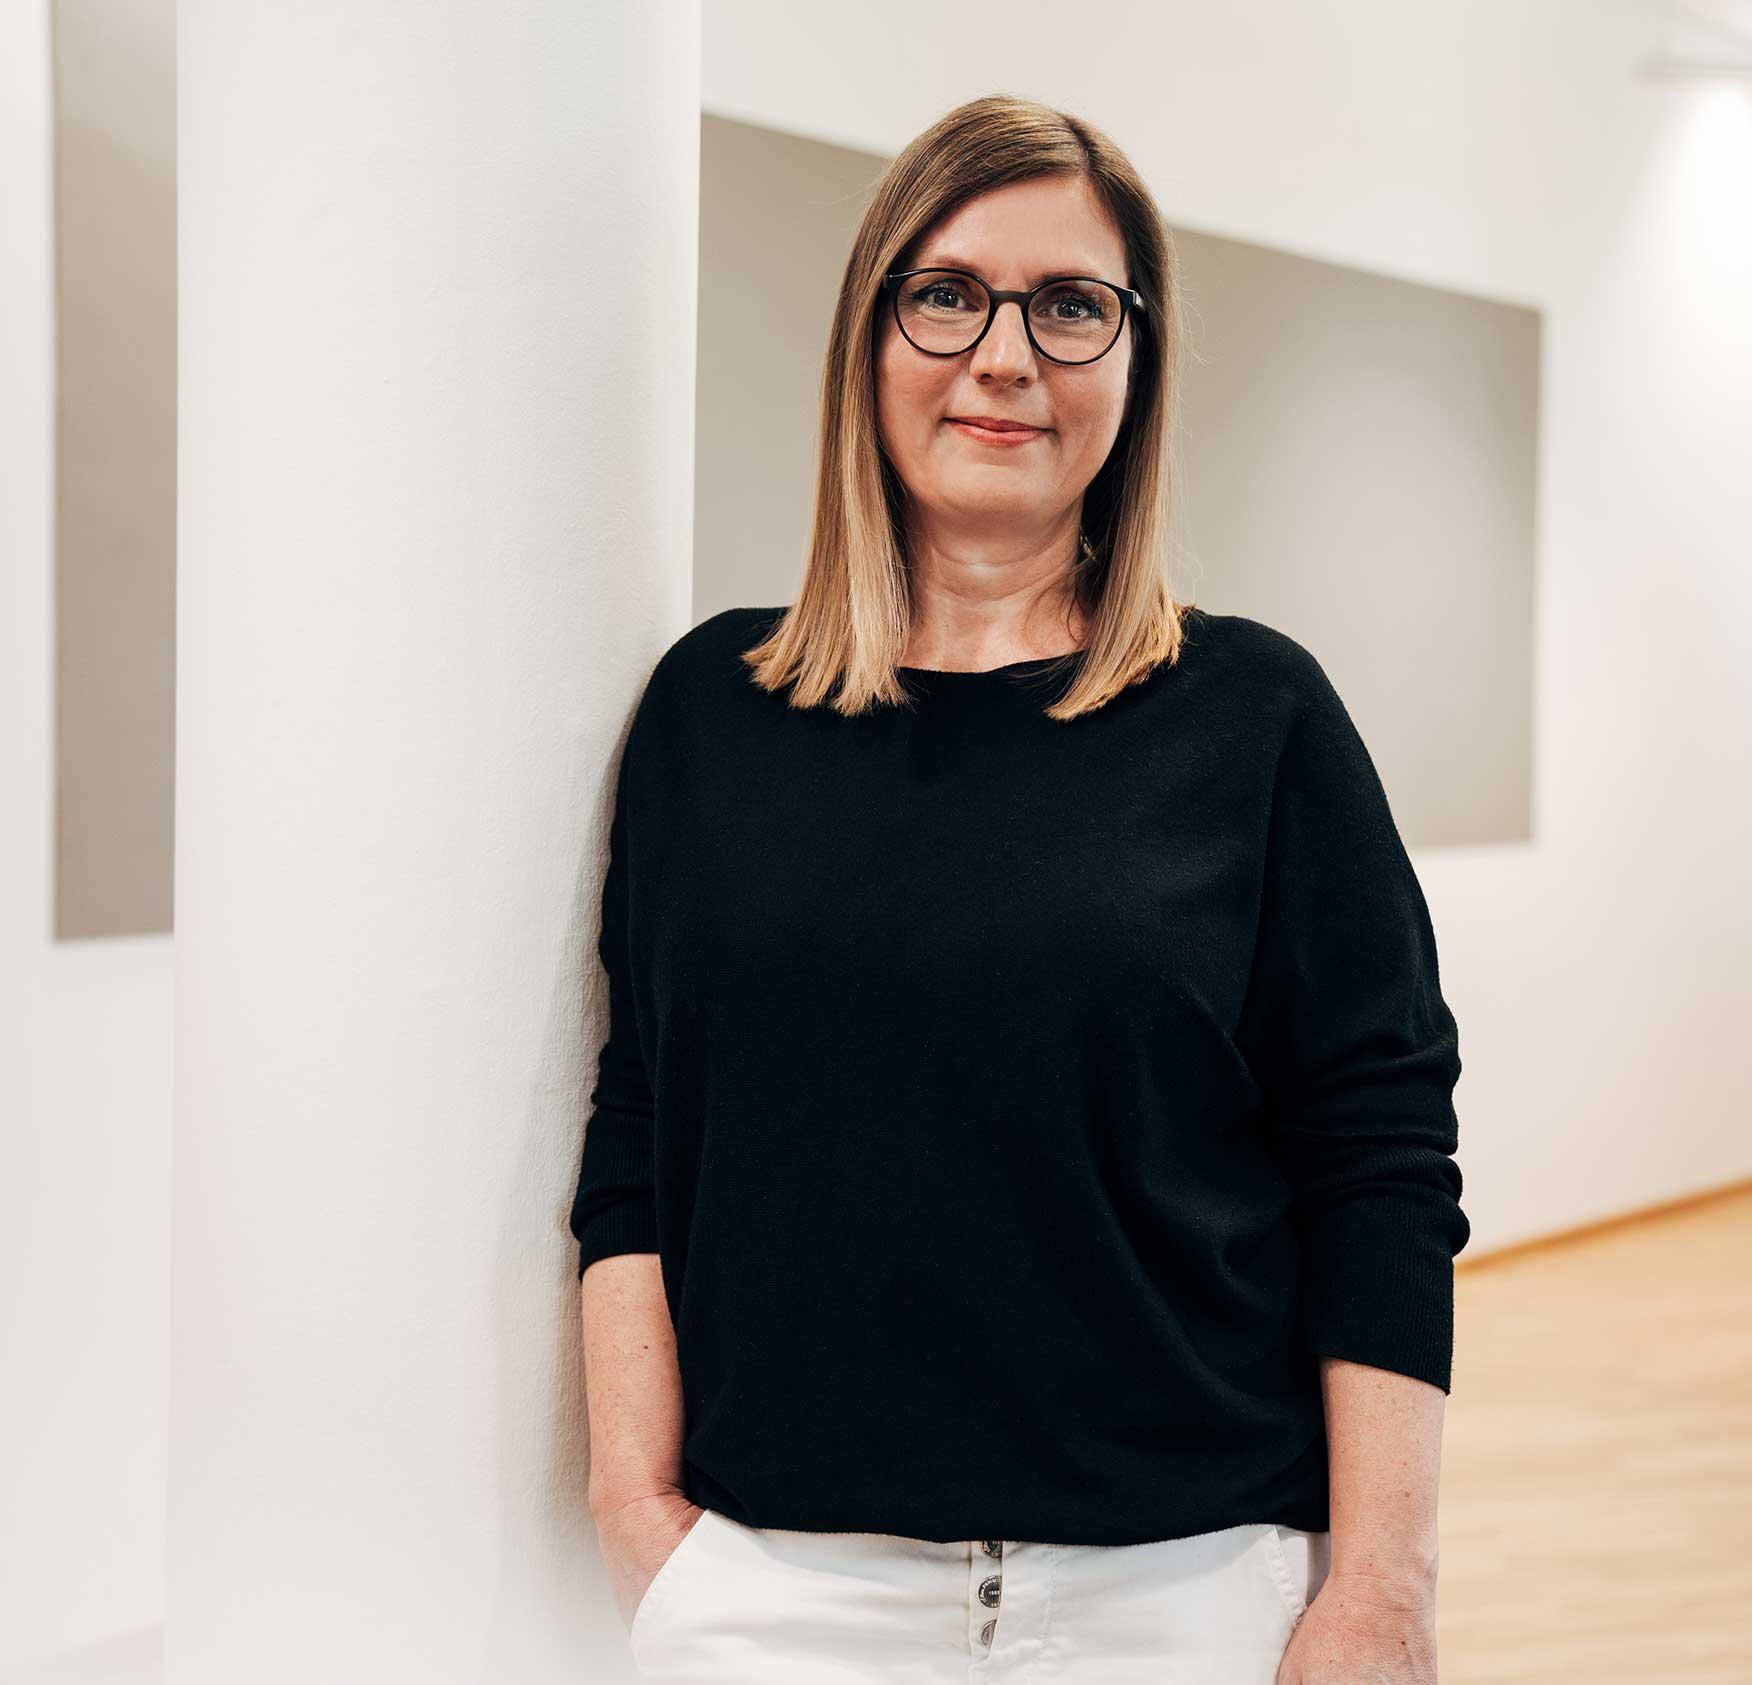 <b>Veronika Schaale</b><br/> Brand Manager Text